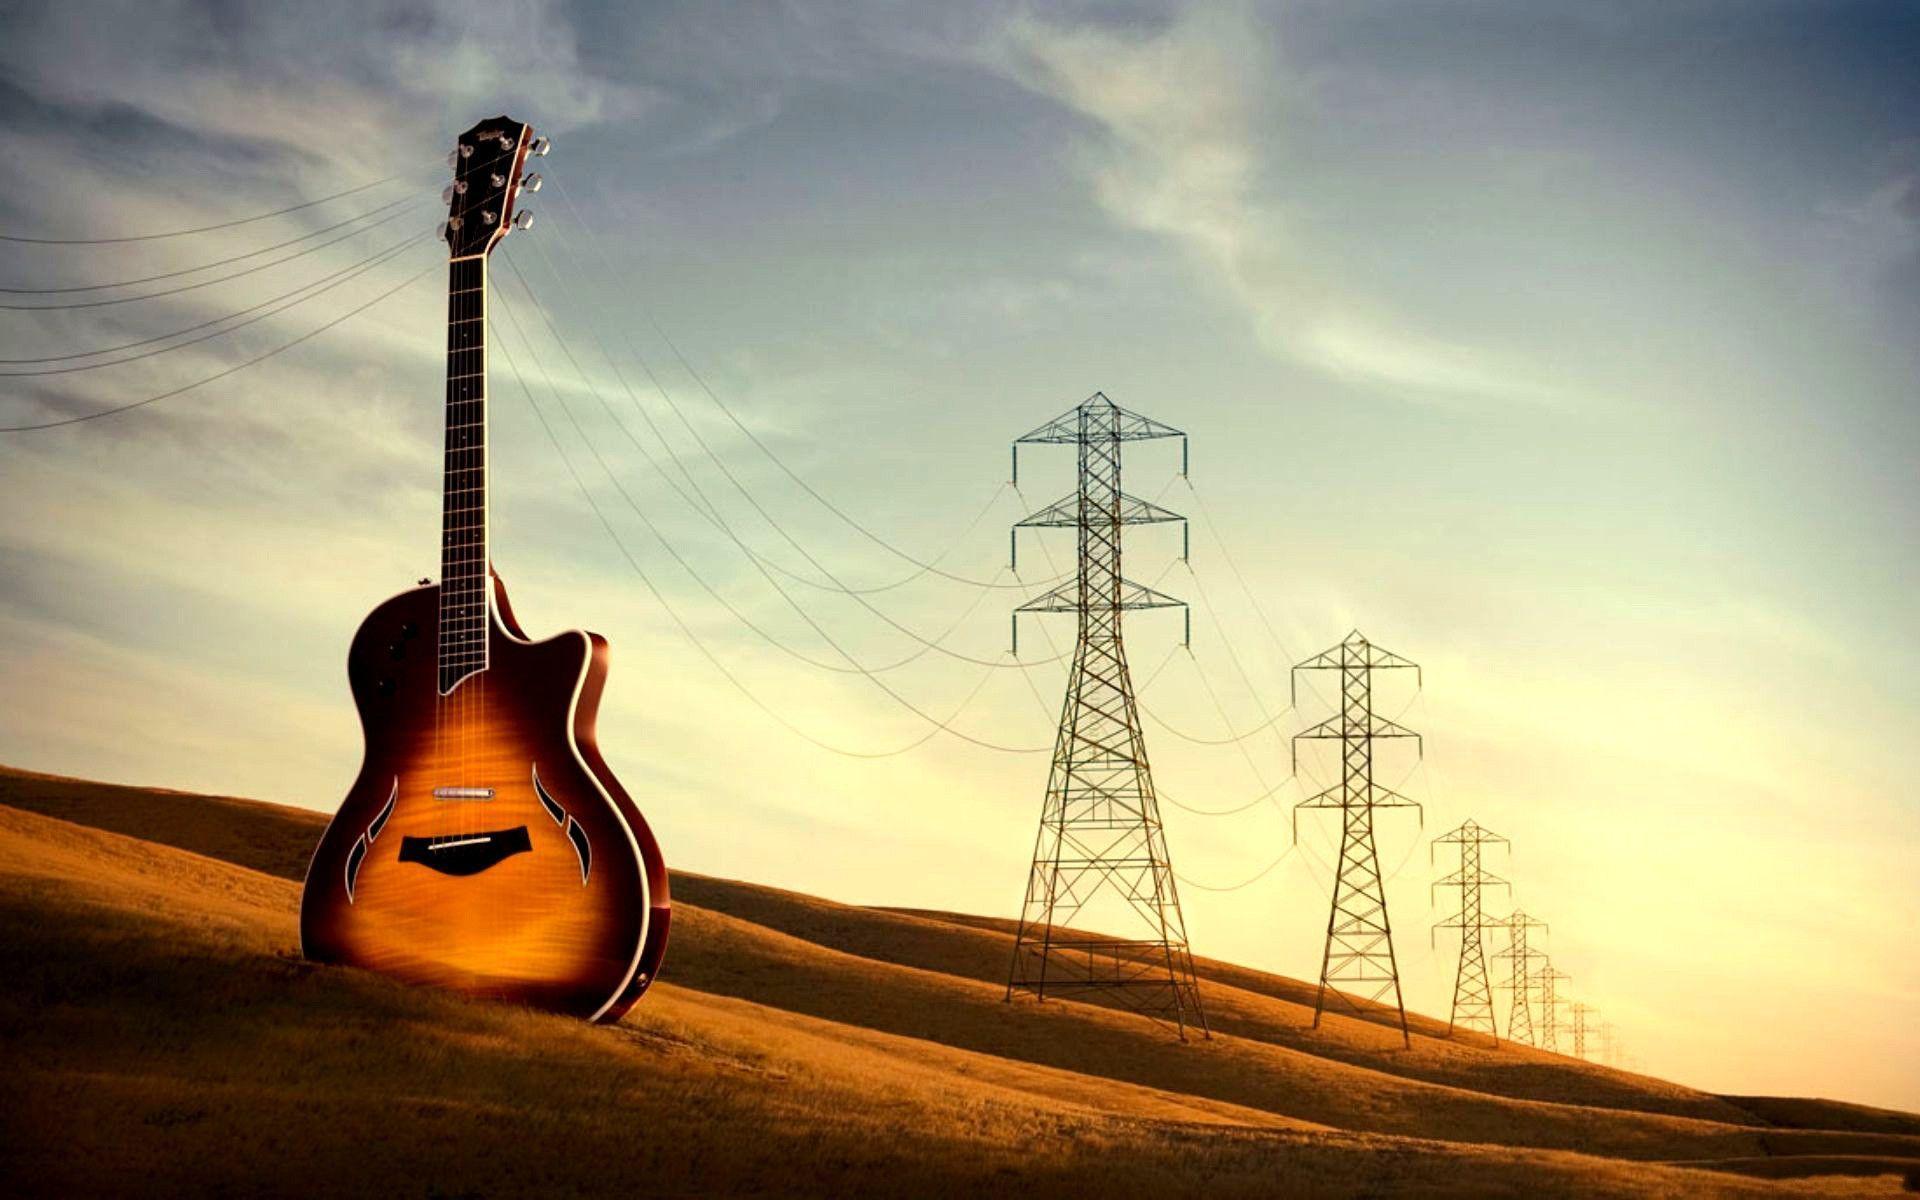 taylor guitars wallpapers - photo #29